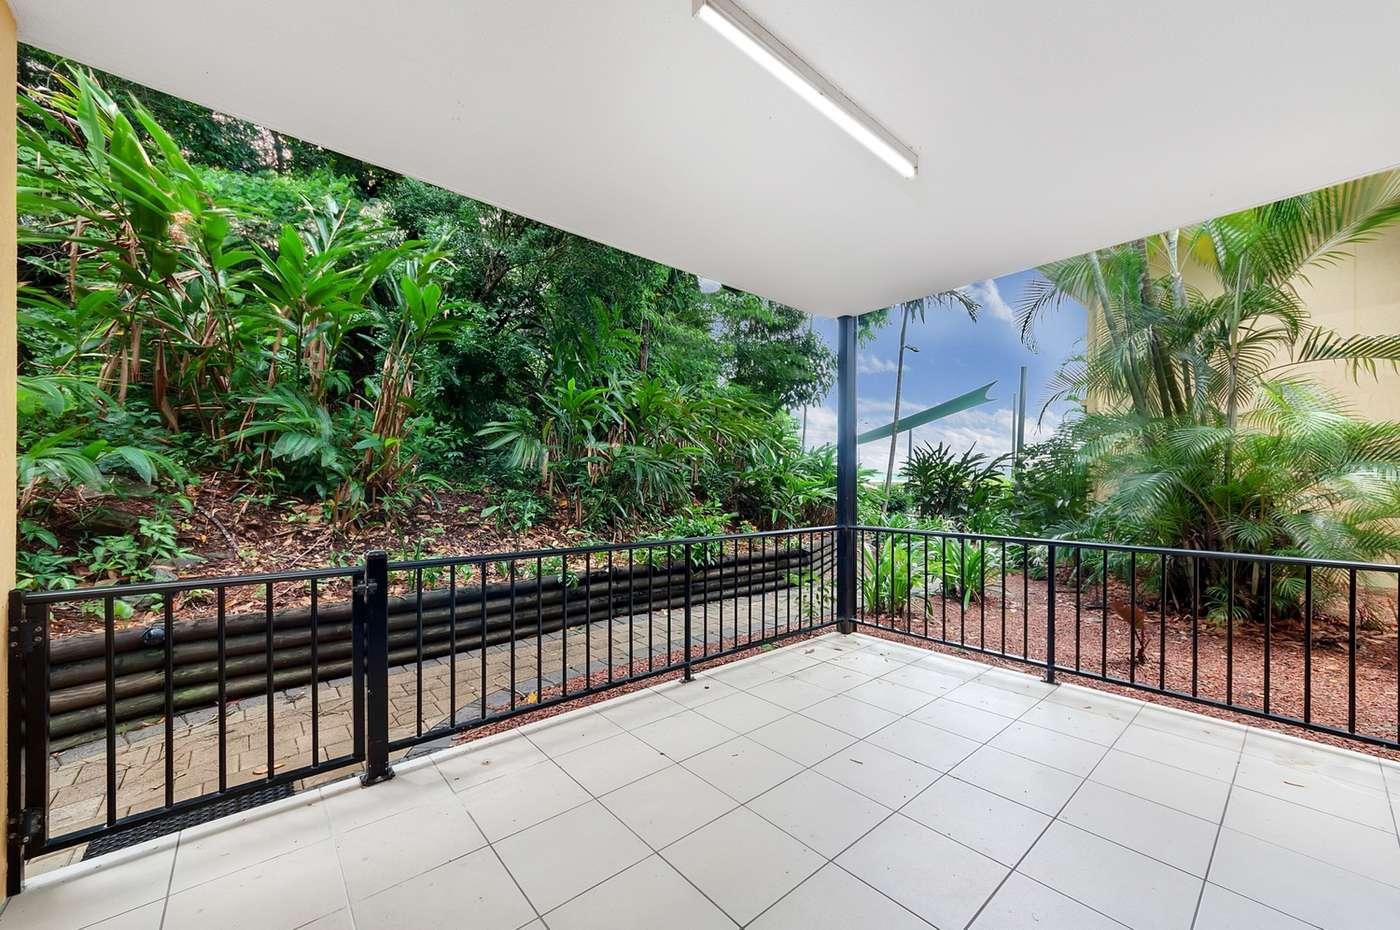 Main view of Homely apartment listing, 21/3 Stratford Parade, Stratford, QLD 4870